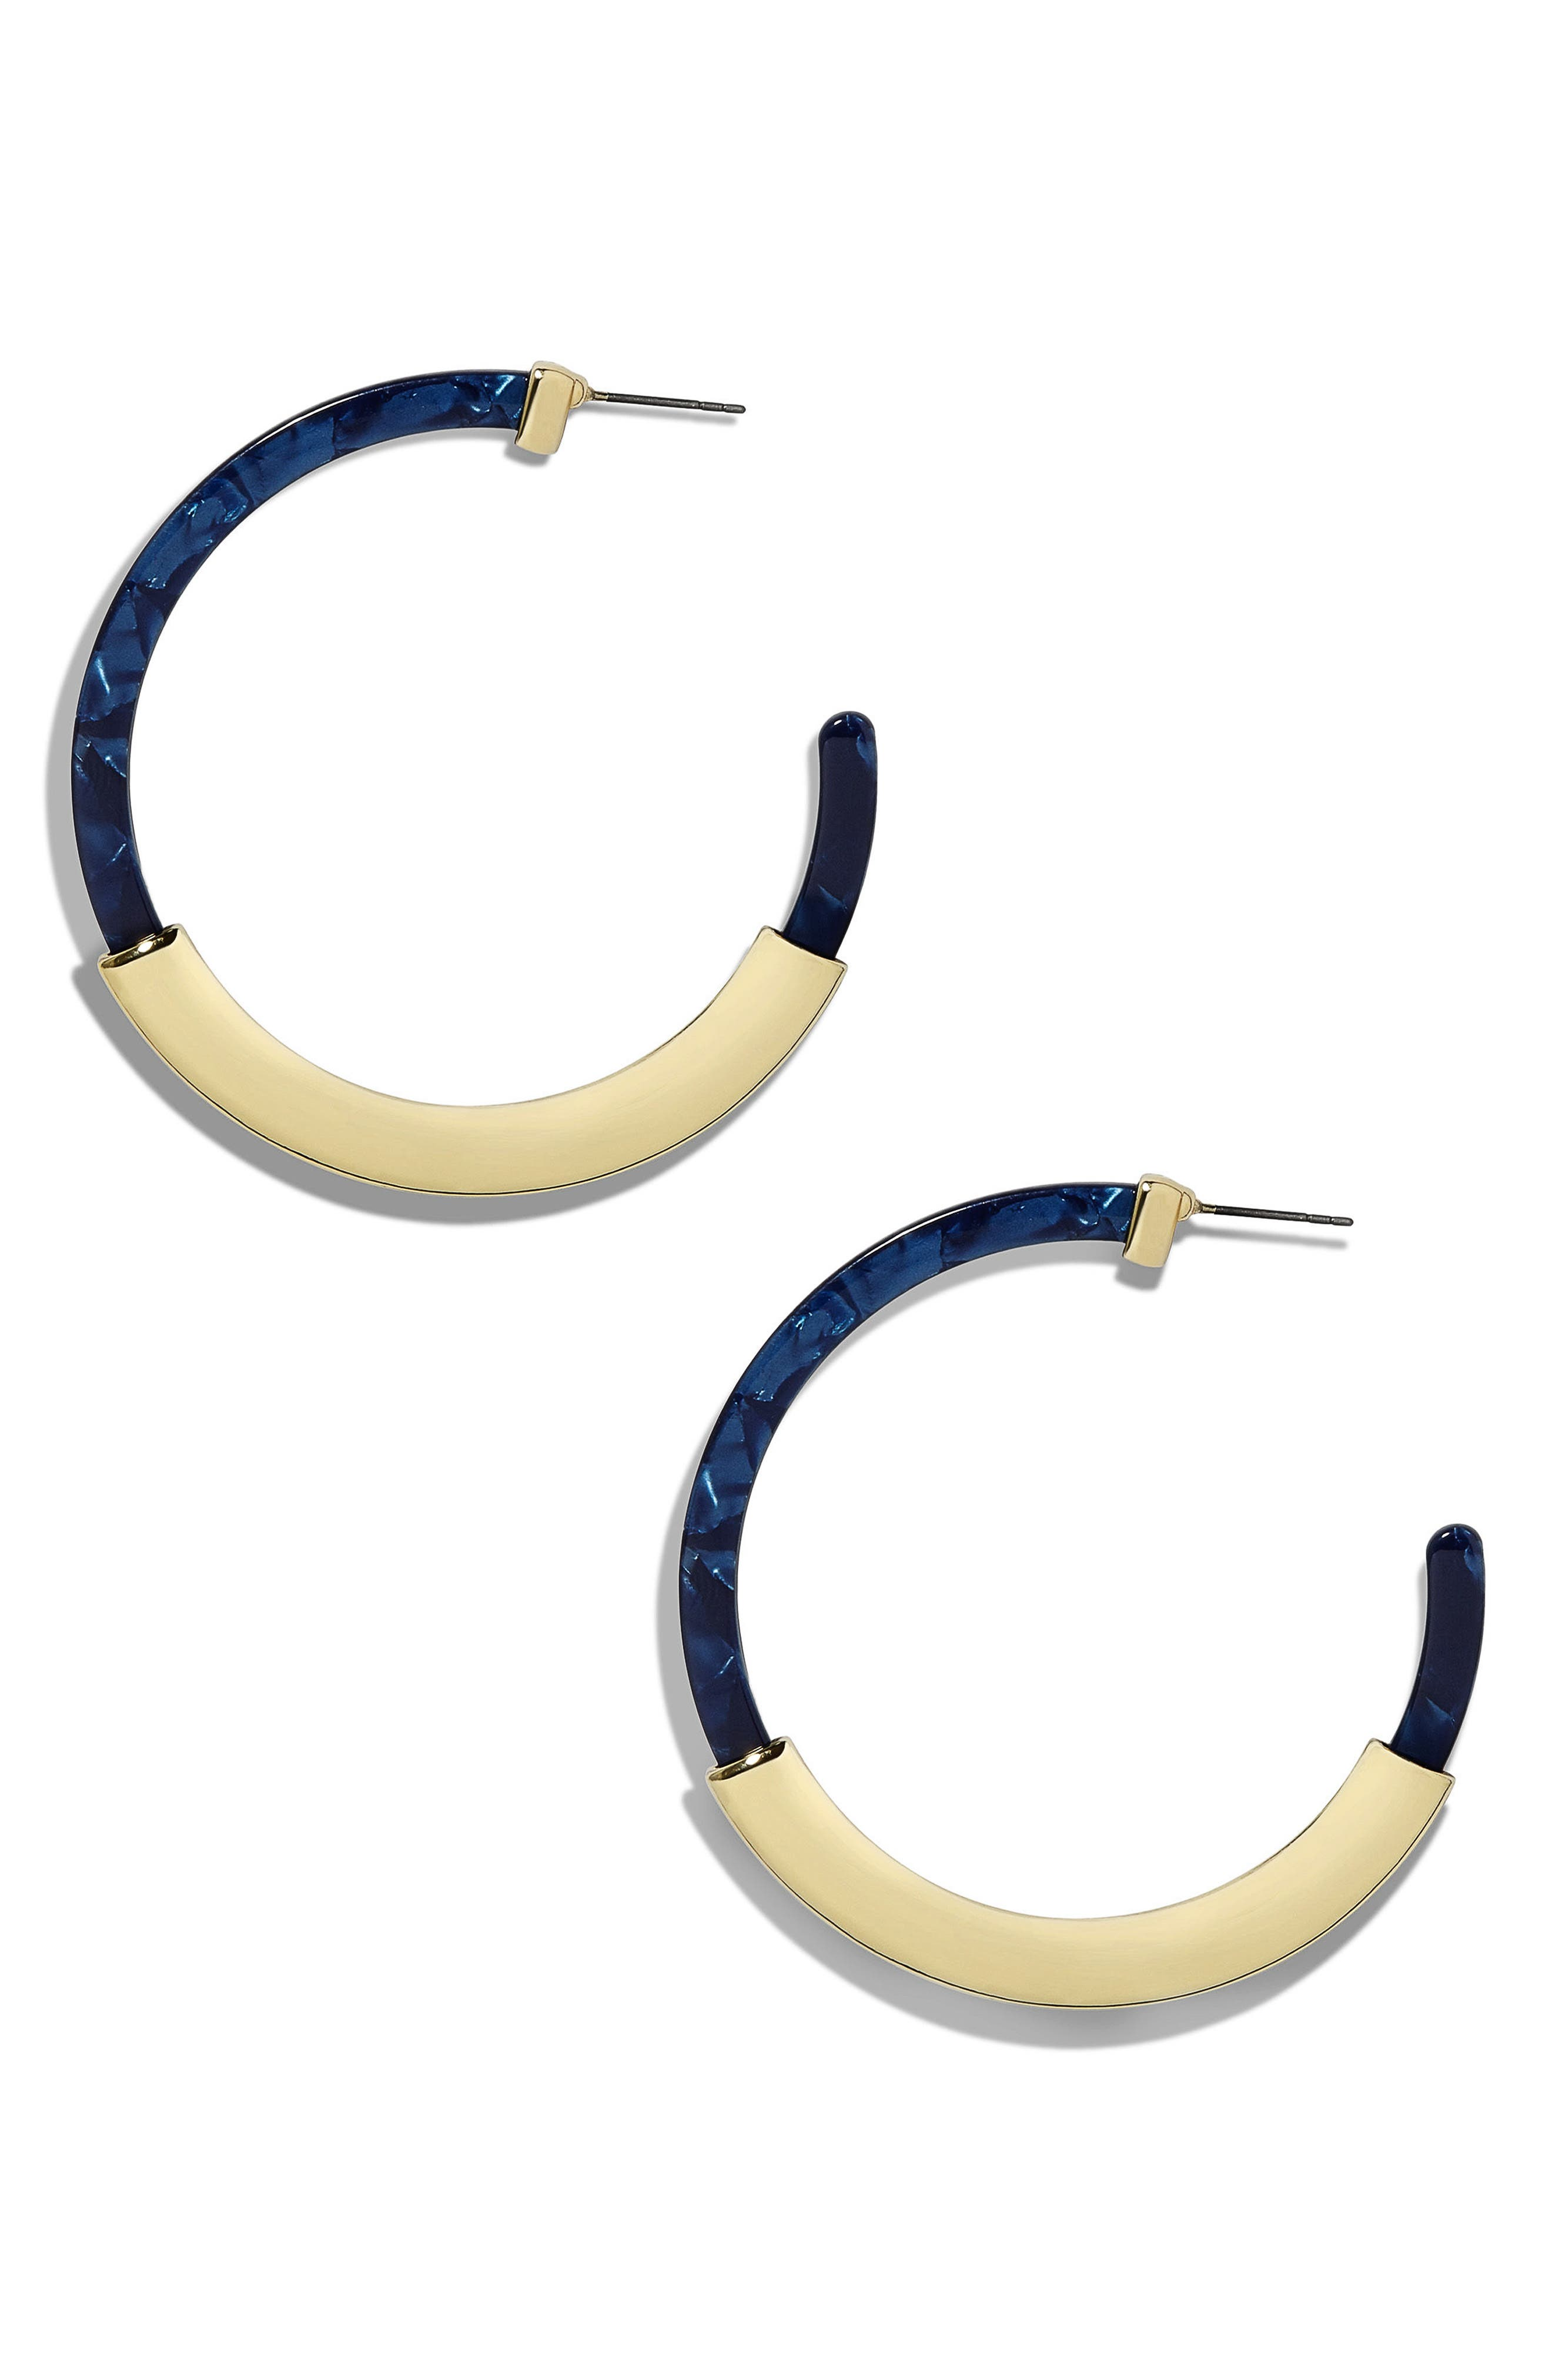 Tassiana Gold & Acrylic Hoop Earrings,                             Main thumbnail 1, color,                             Cobalt